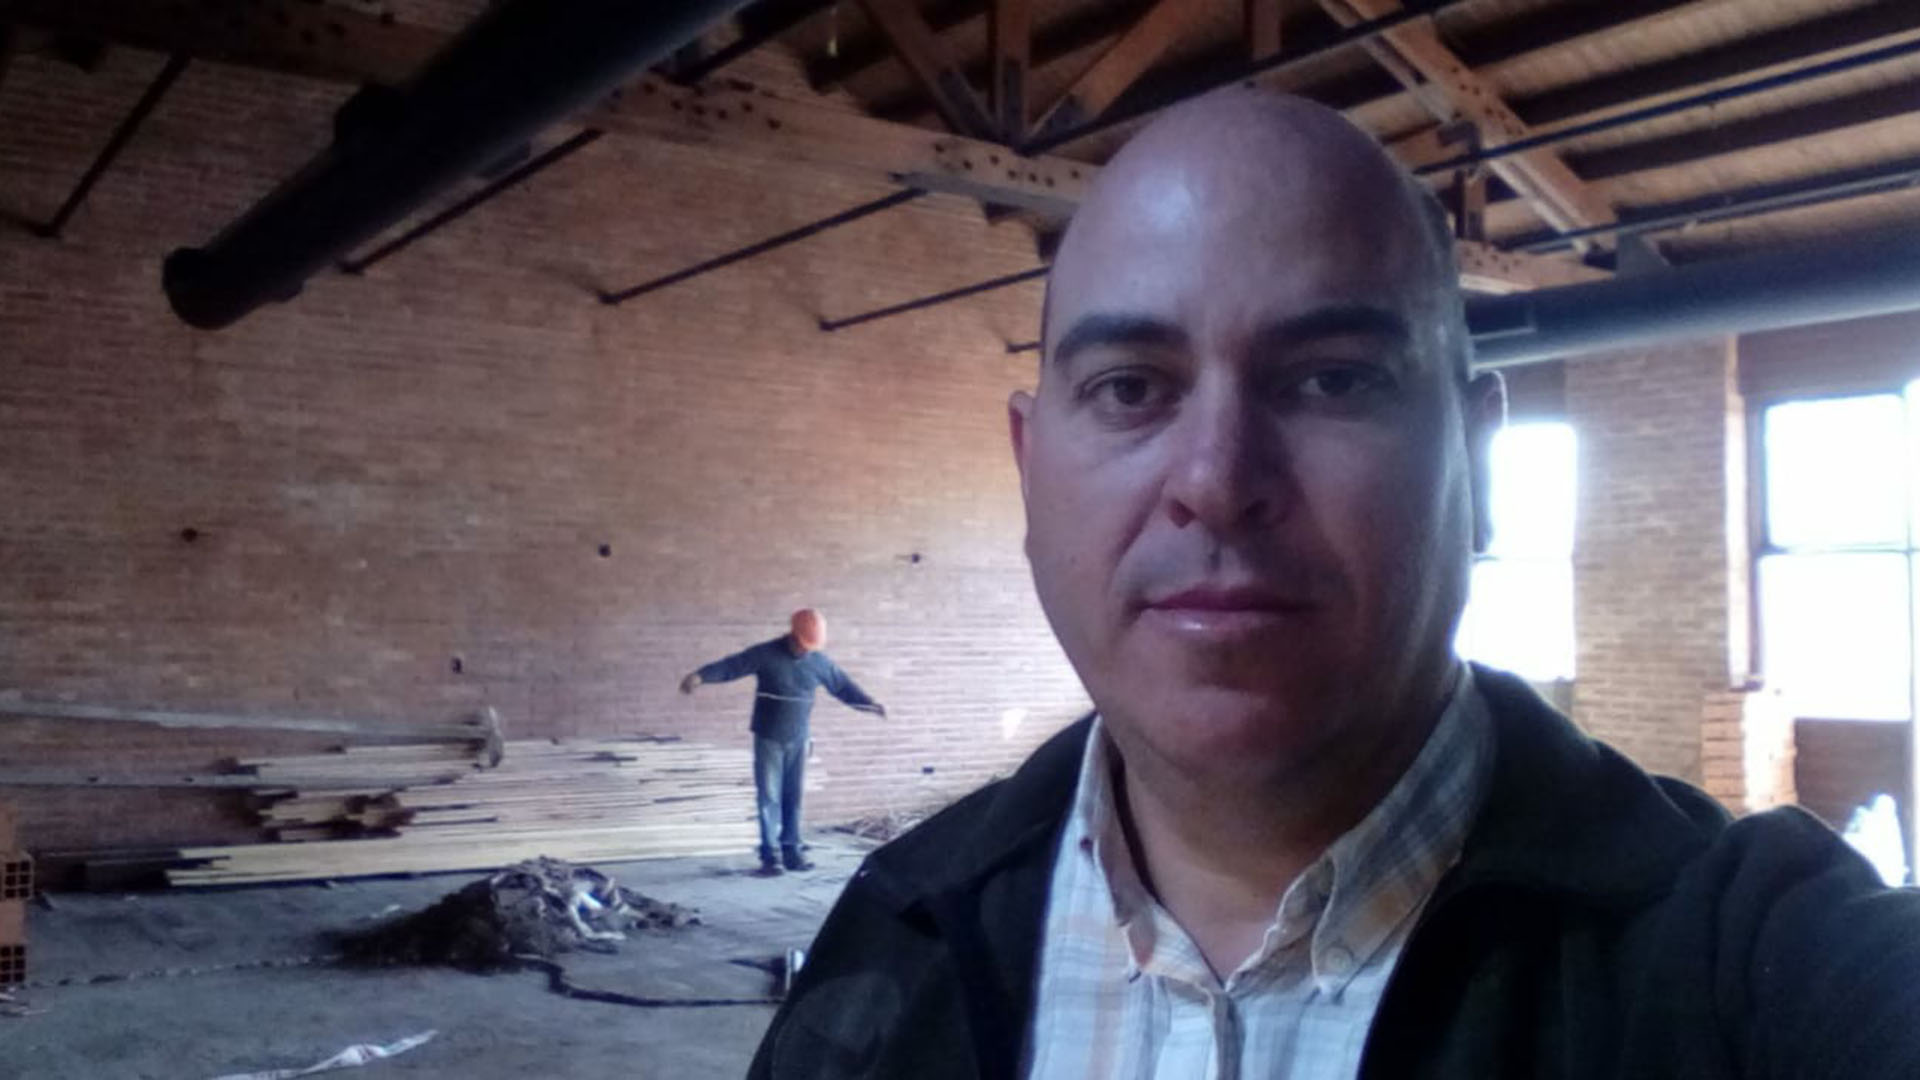 Vicente MArtinez ingeniero venezolano